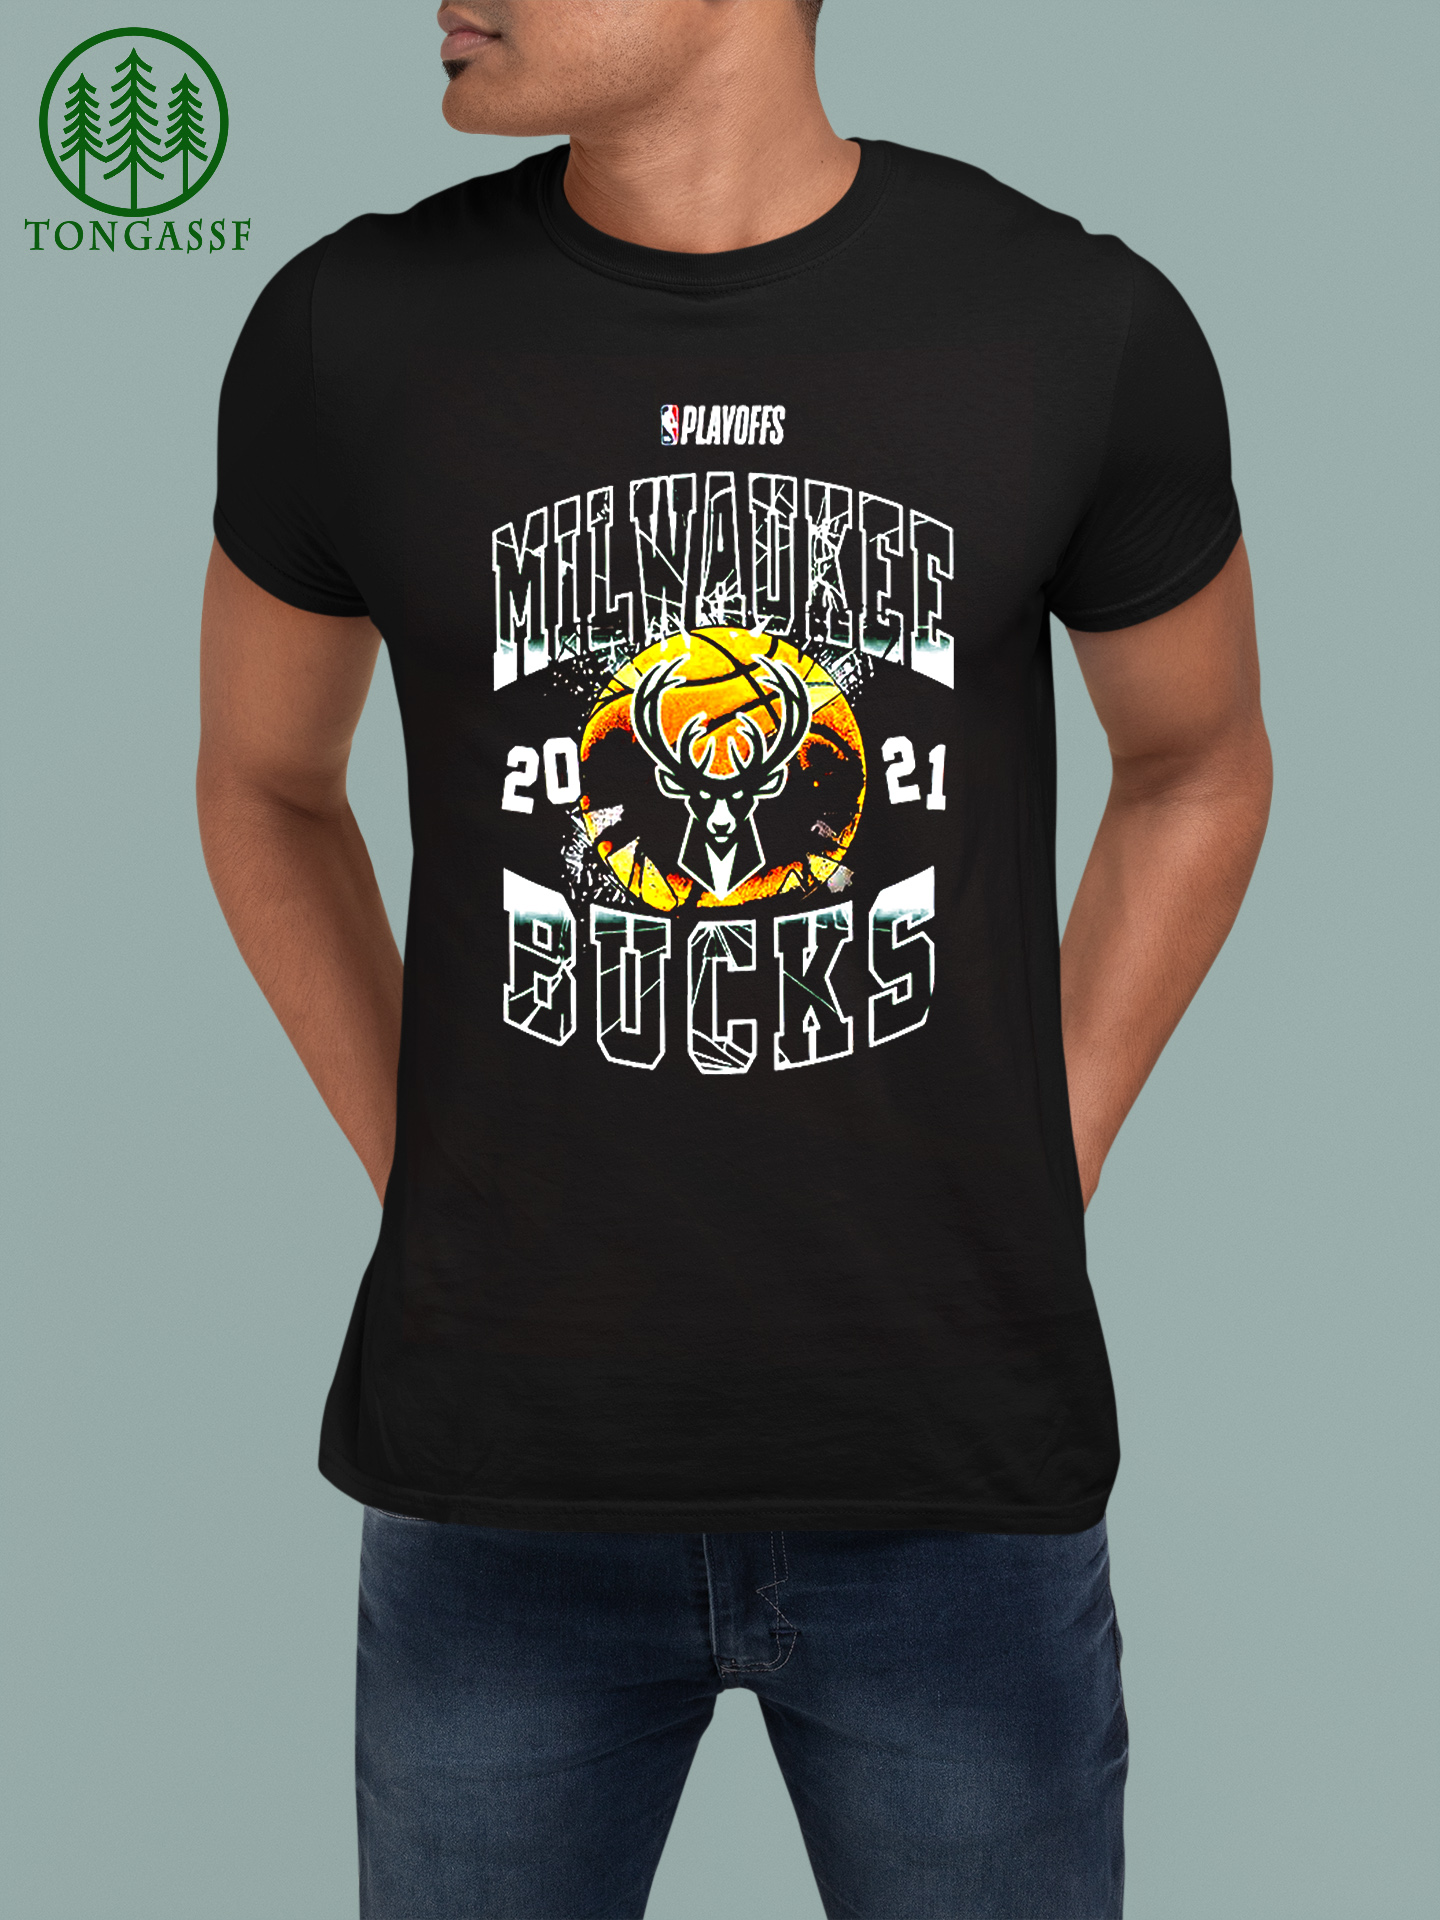 Baseball Basketball Collections of T shirt 2D